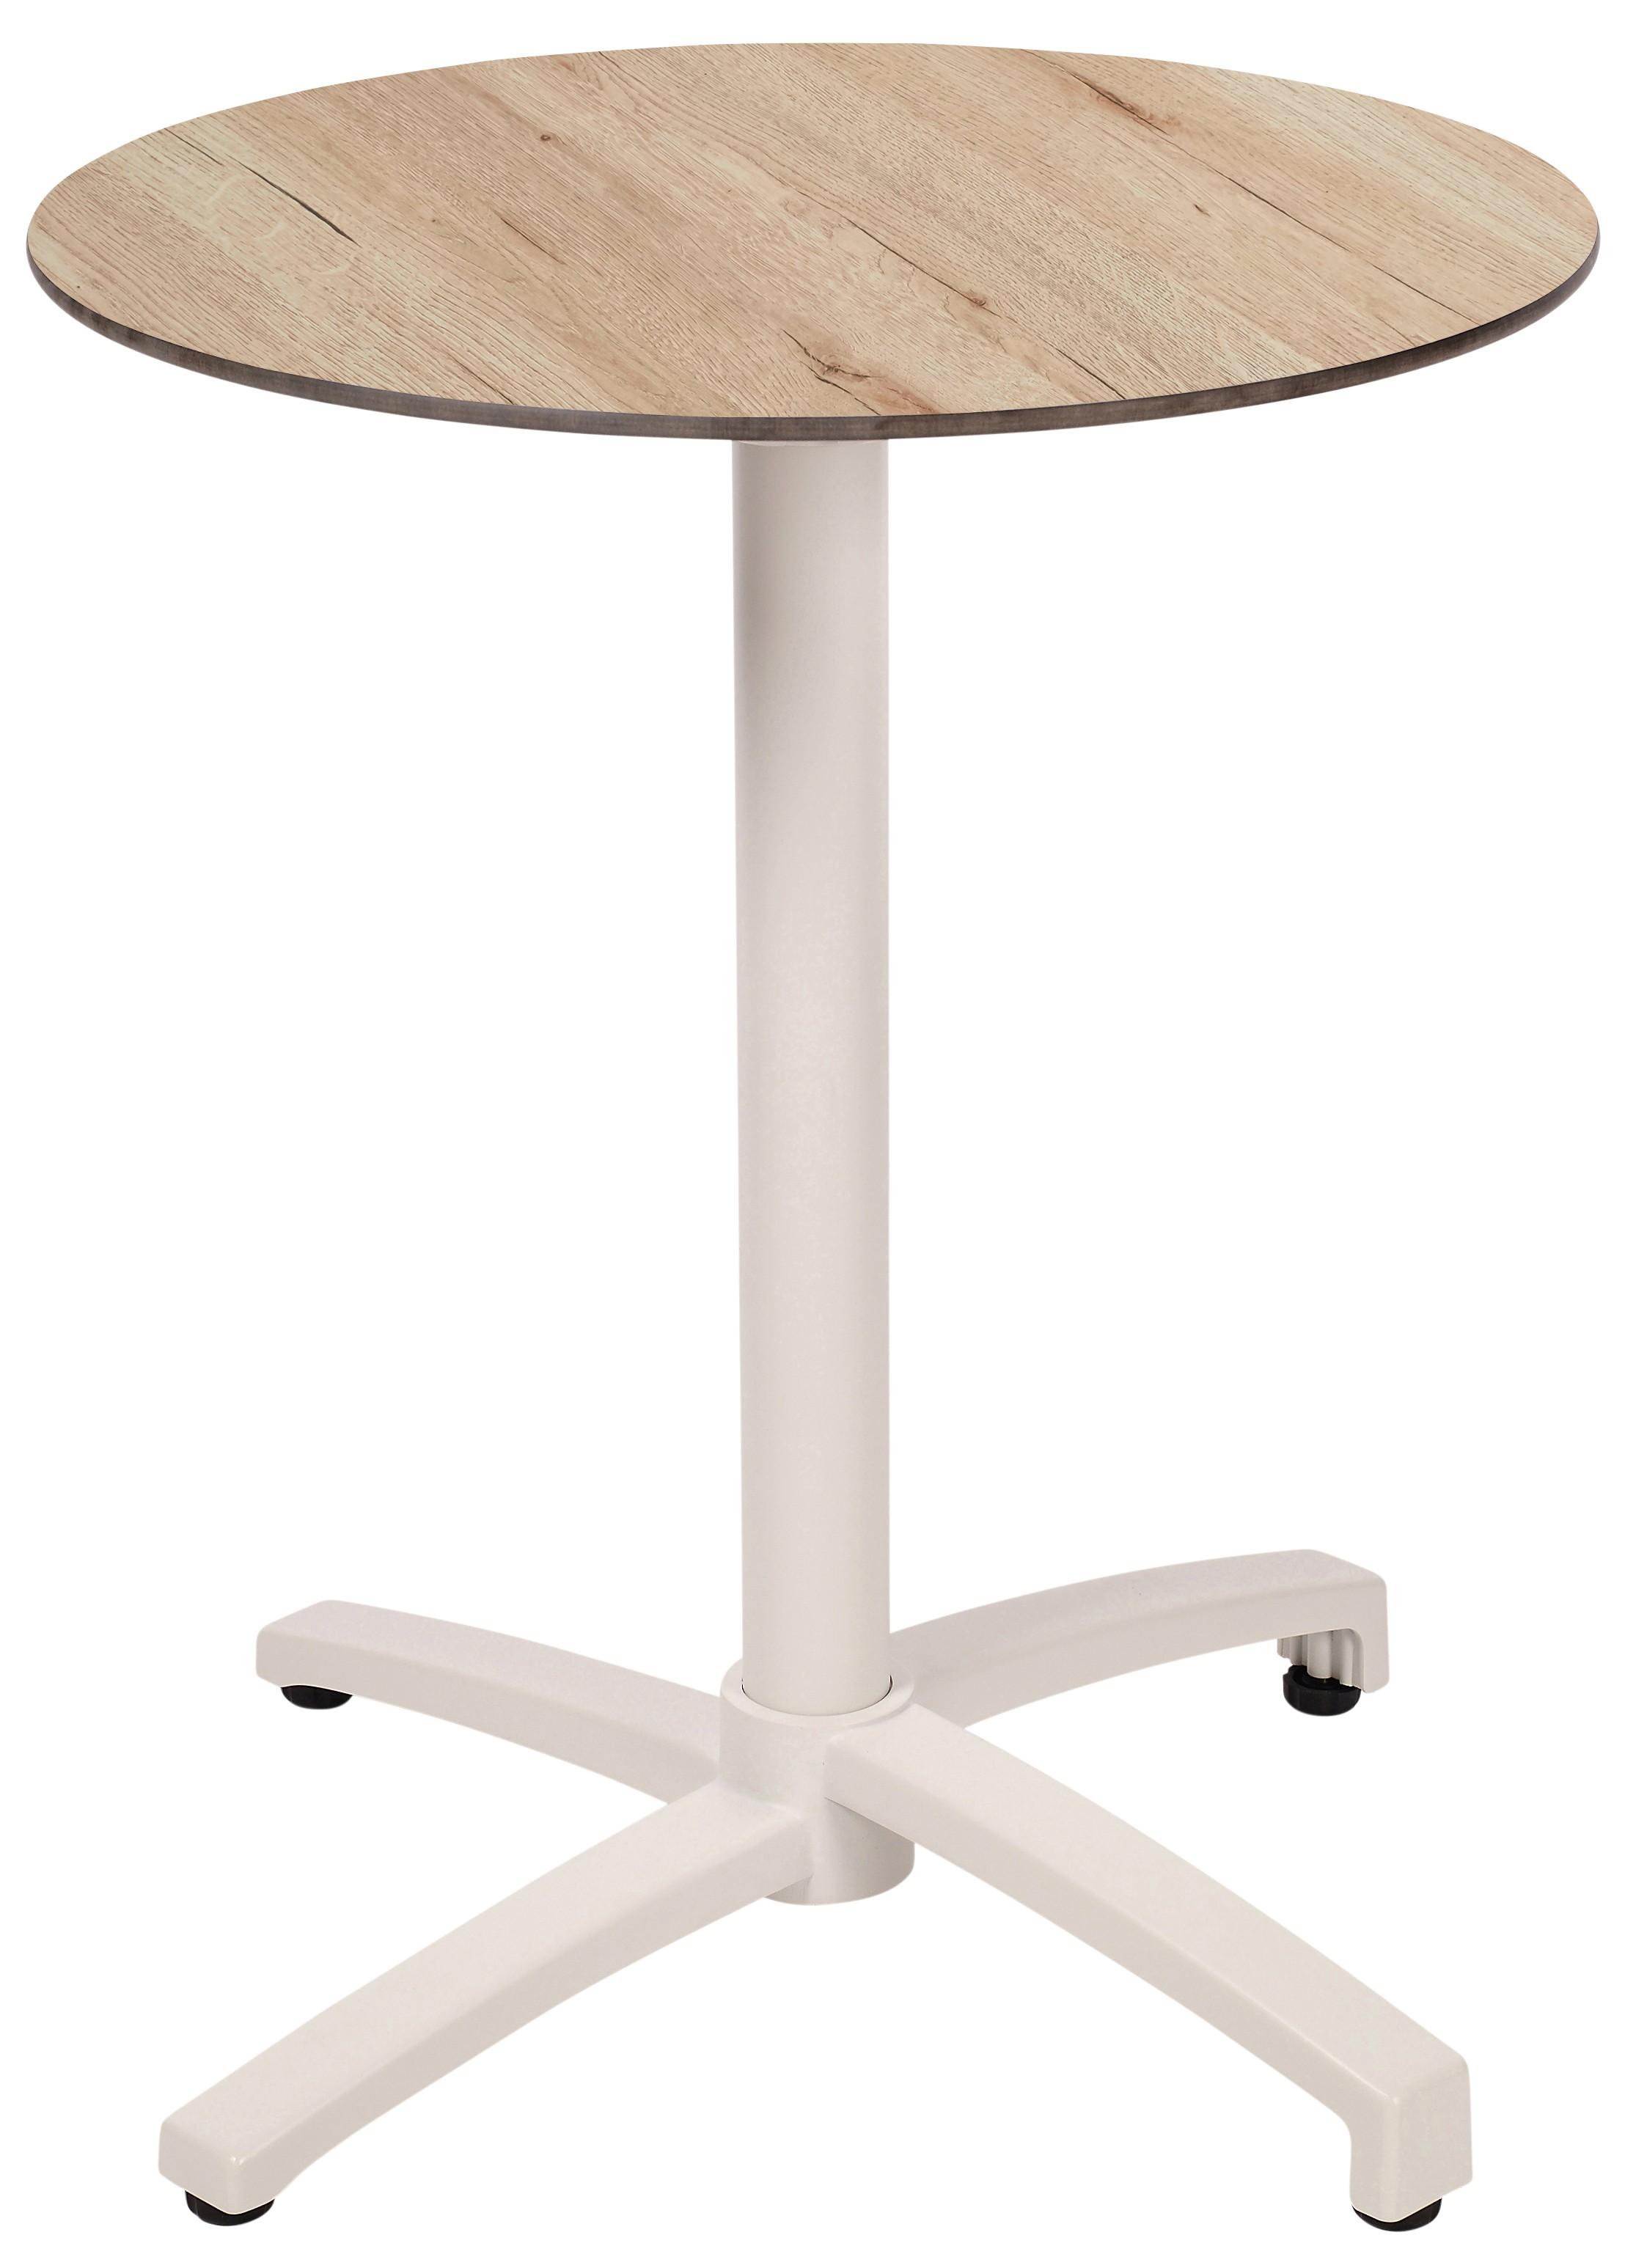 Mesa Ezpeleta abatible white Blancos oak Aluminio lacado 60